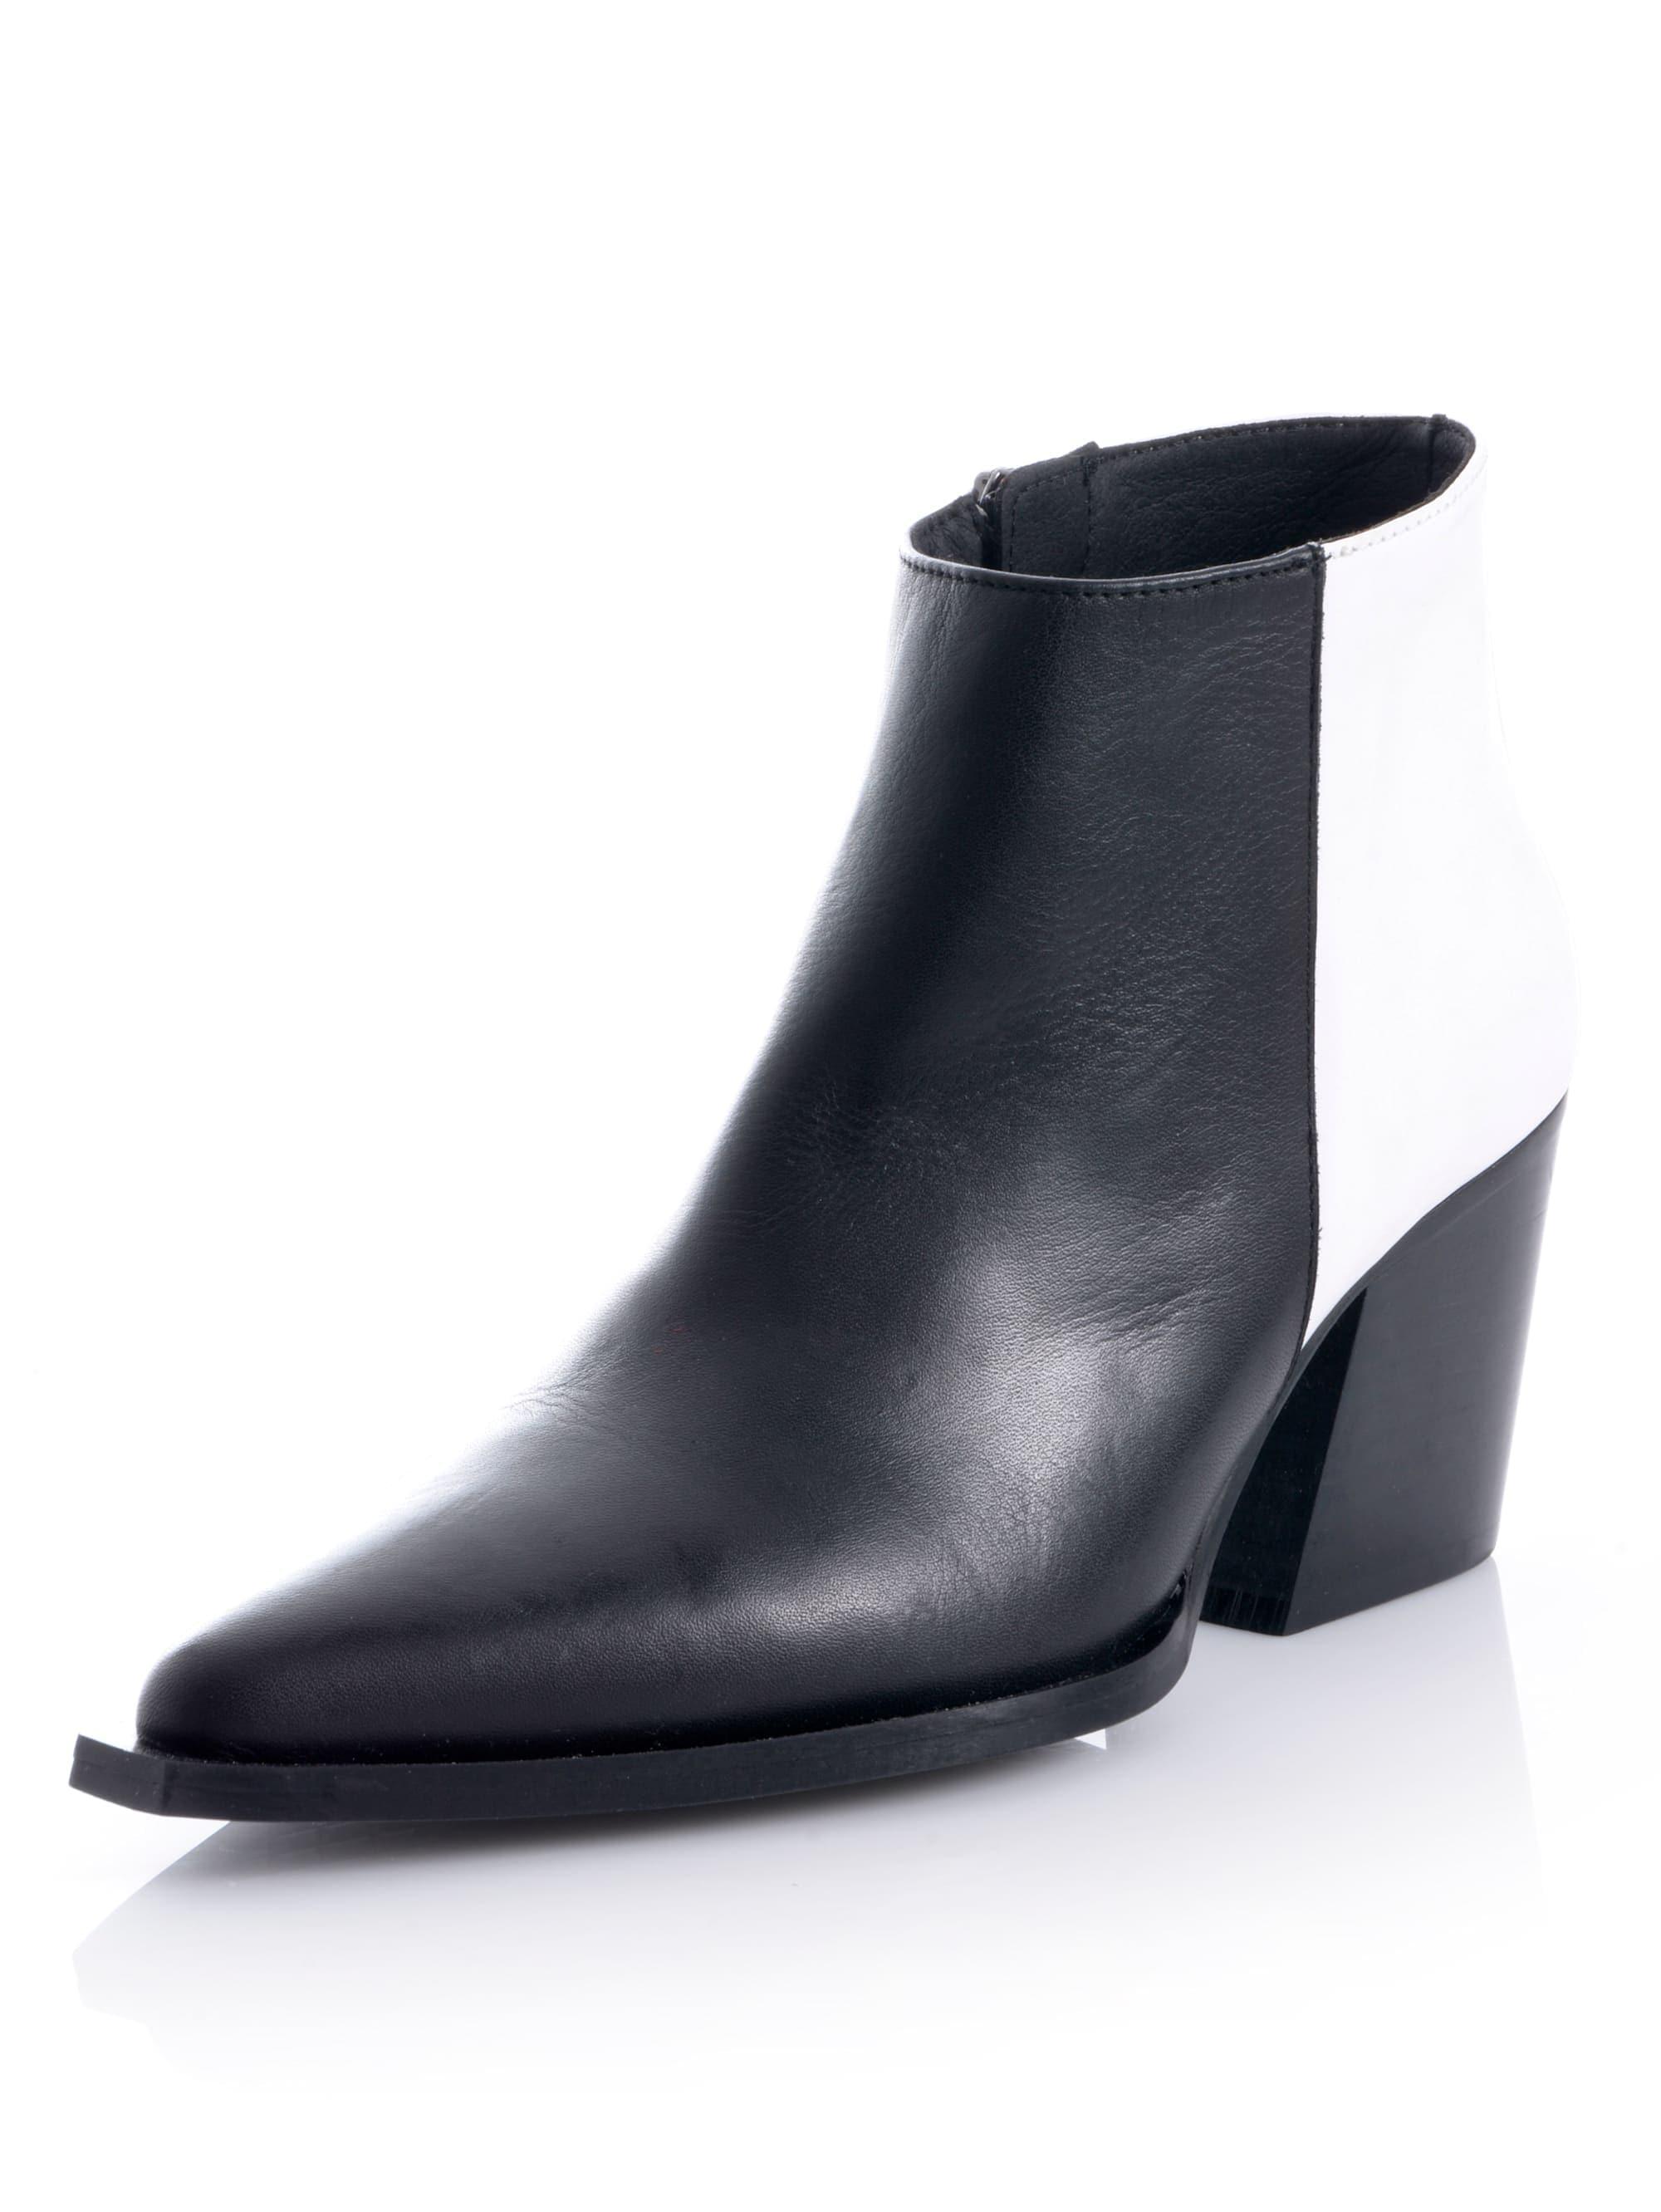 alba moda -  Ankleboots, im Cowboy-Style